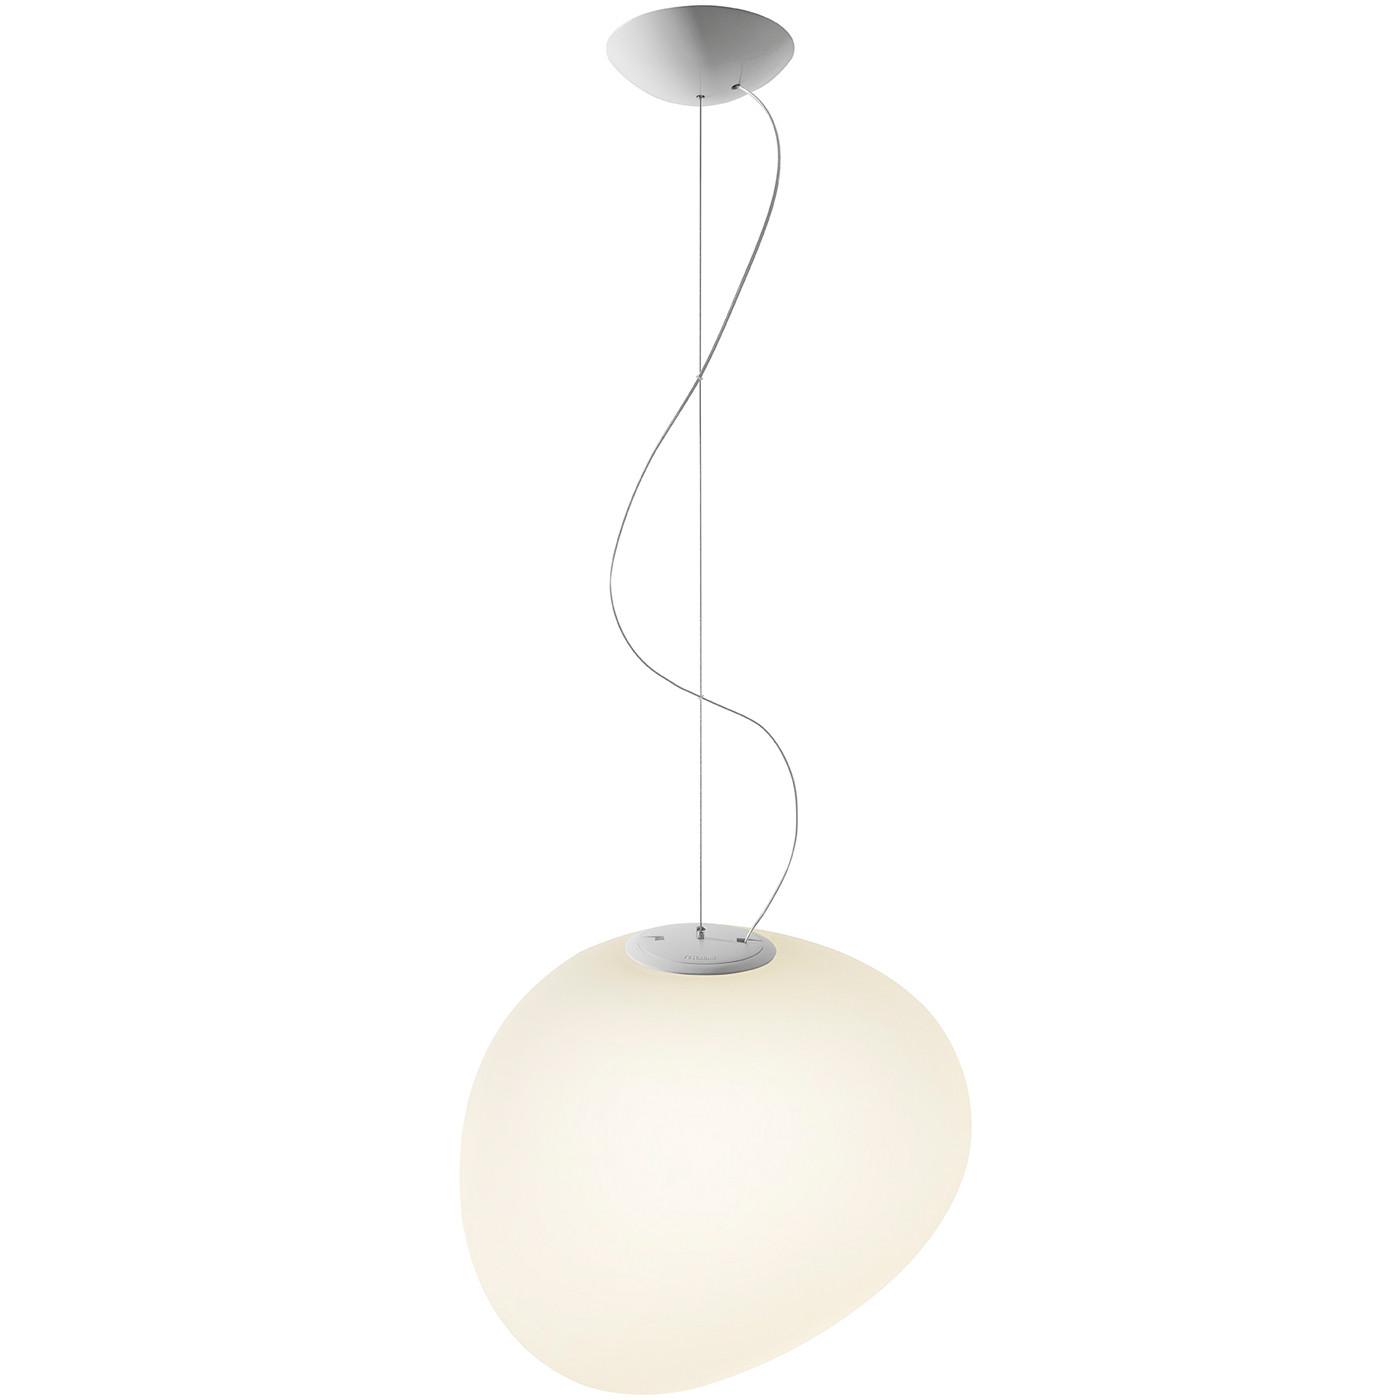 Foscarini Gregg Grande Sospensione LED